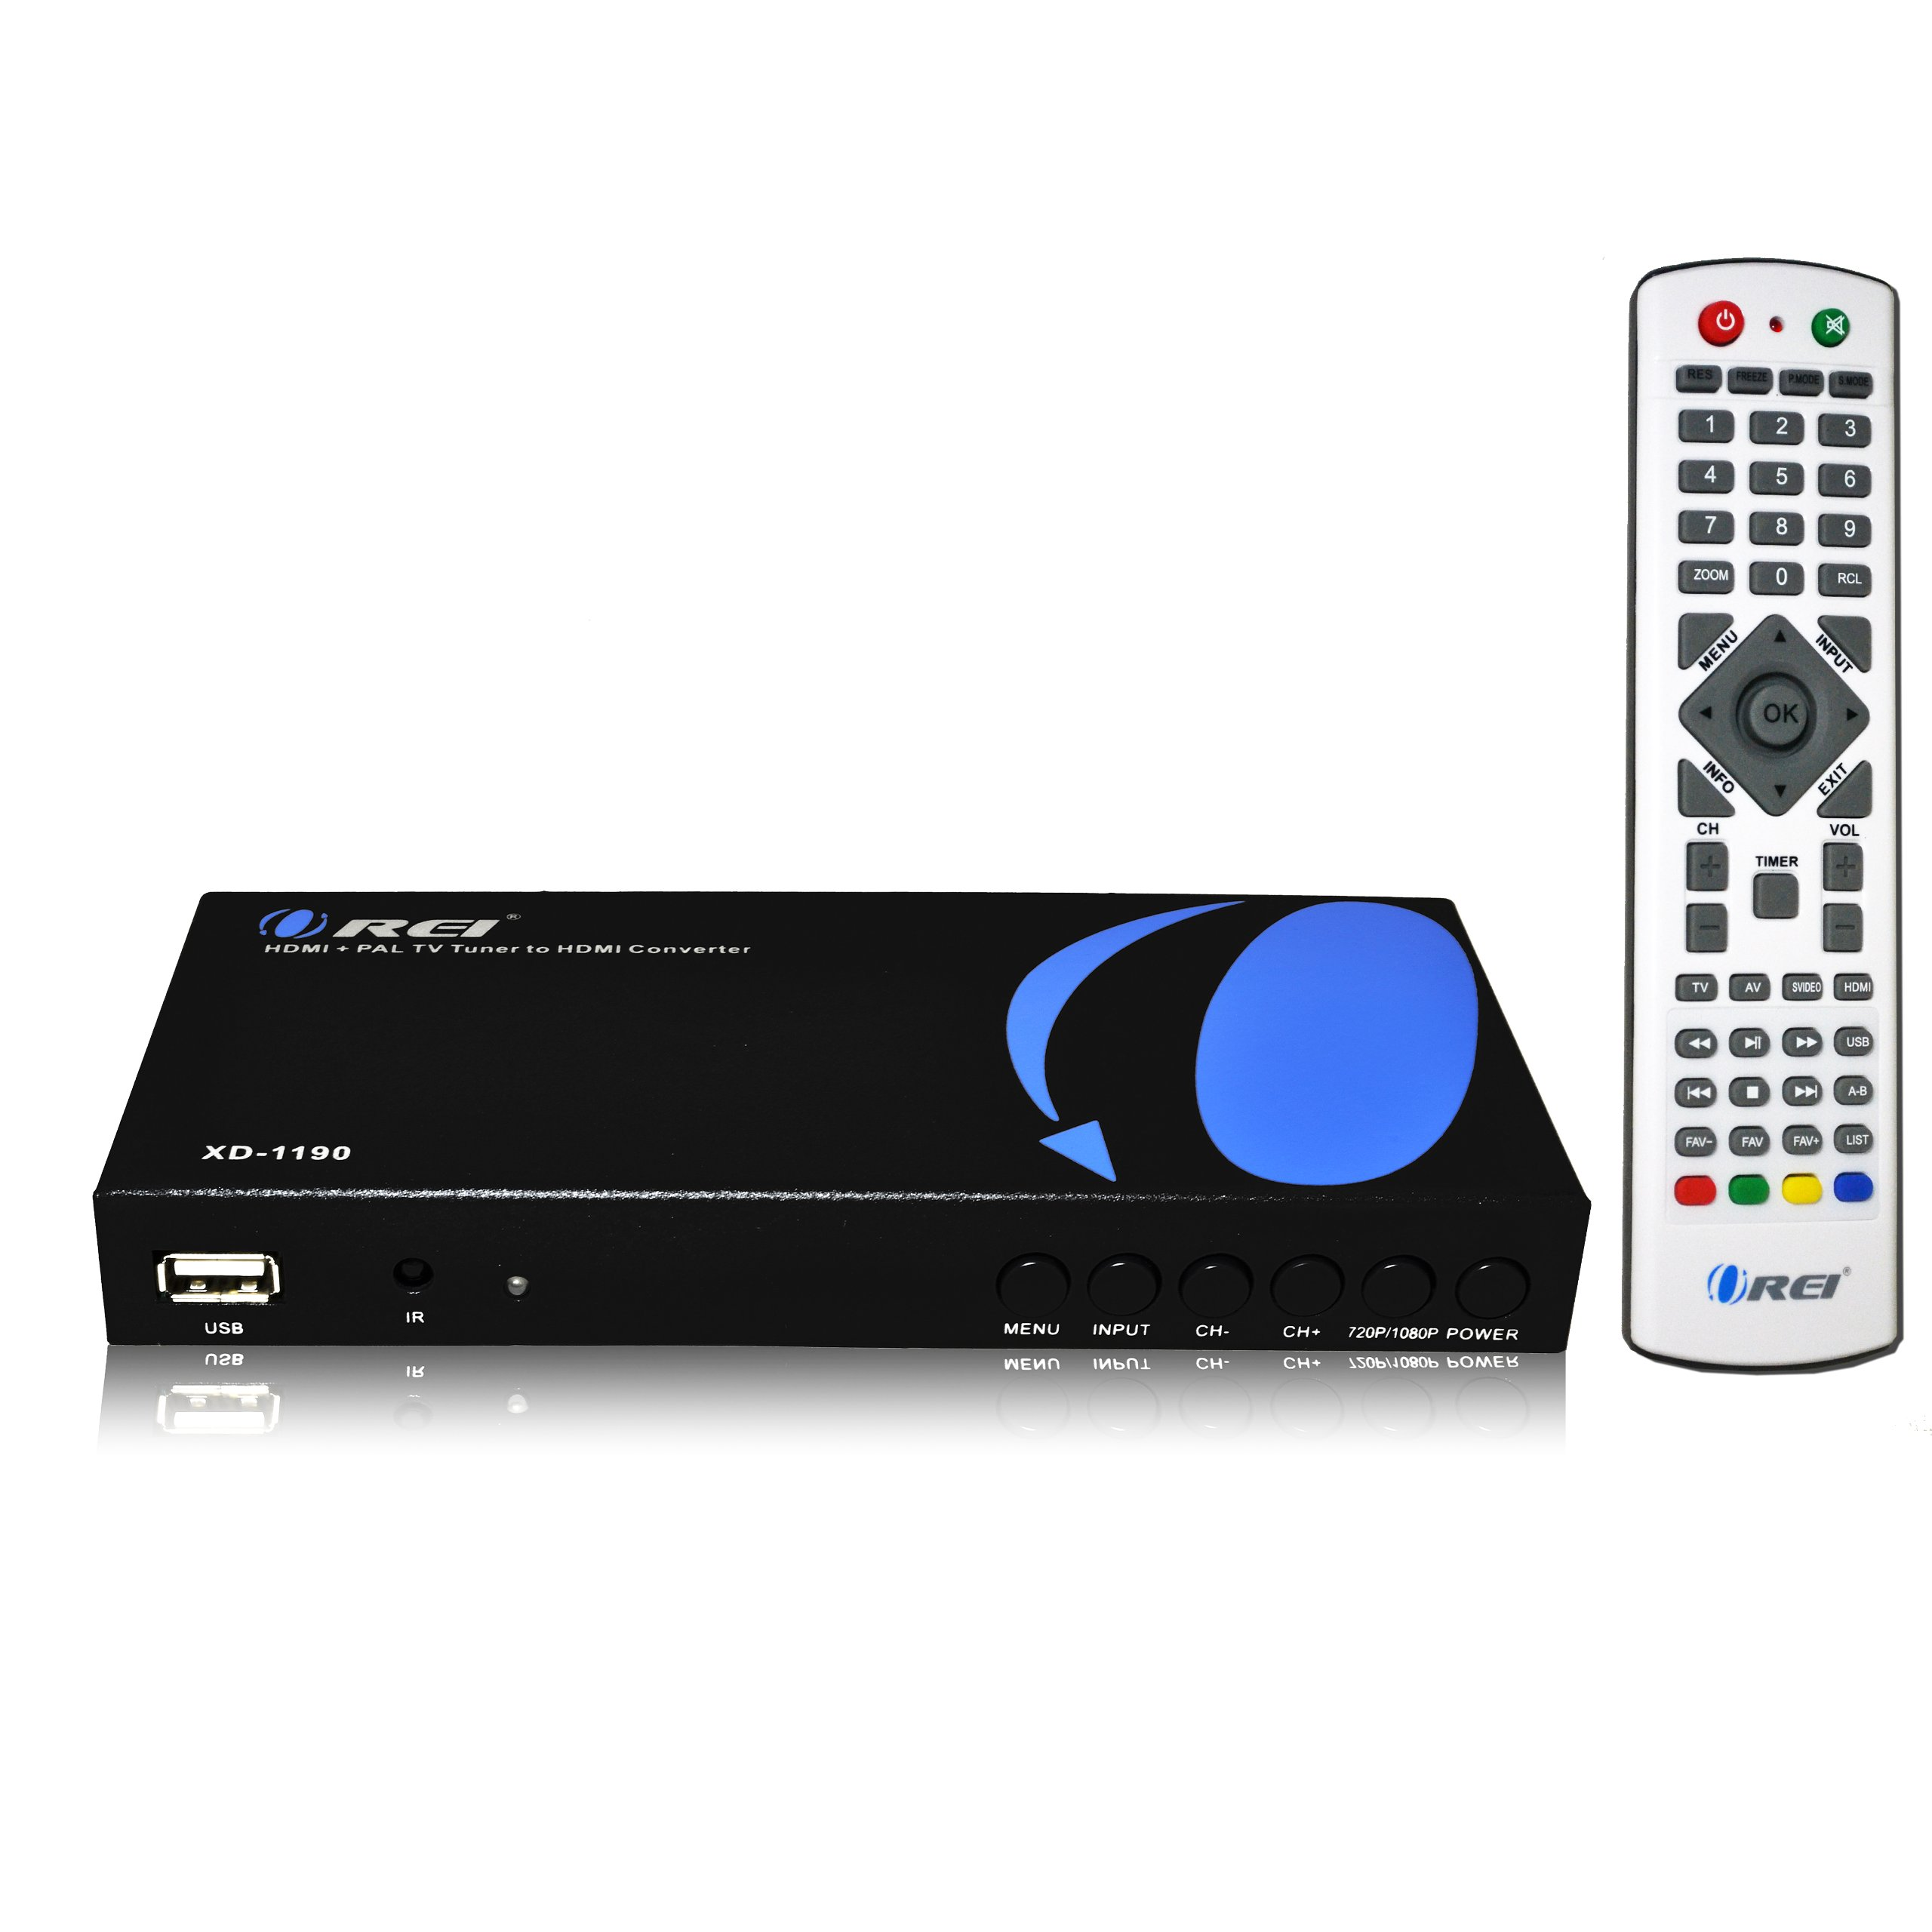 Orei XD-1190 PAL HDMI/RCA to NTSC HDMI Converter Built in Analog TV Tuner